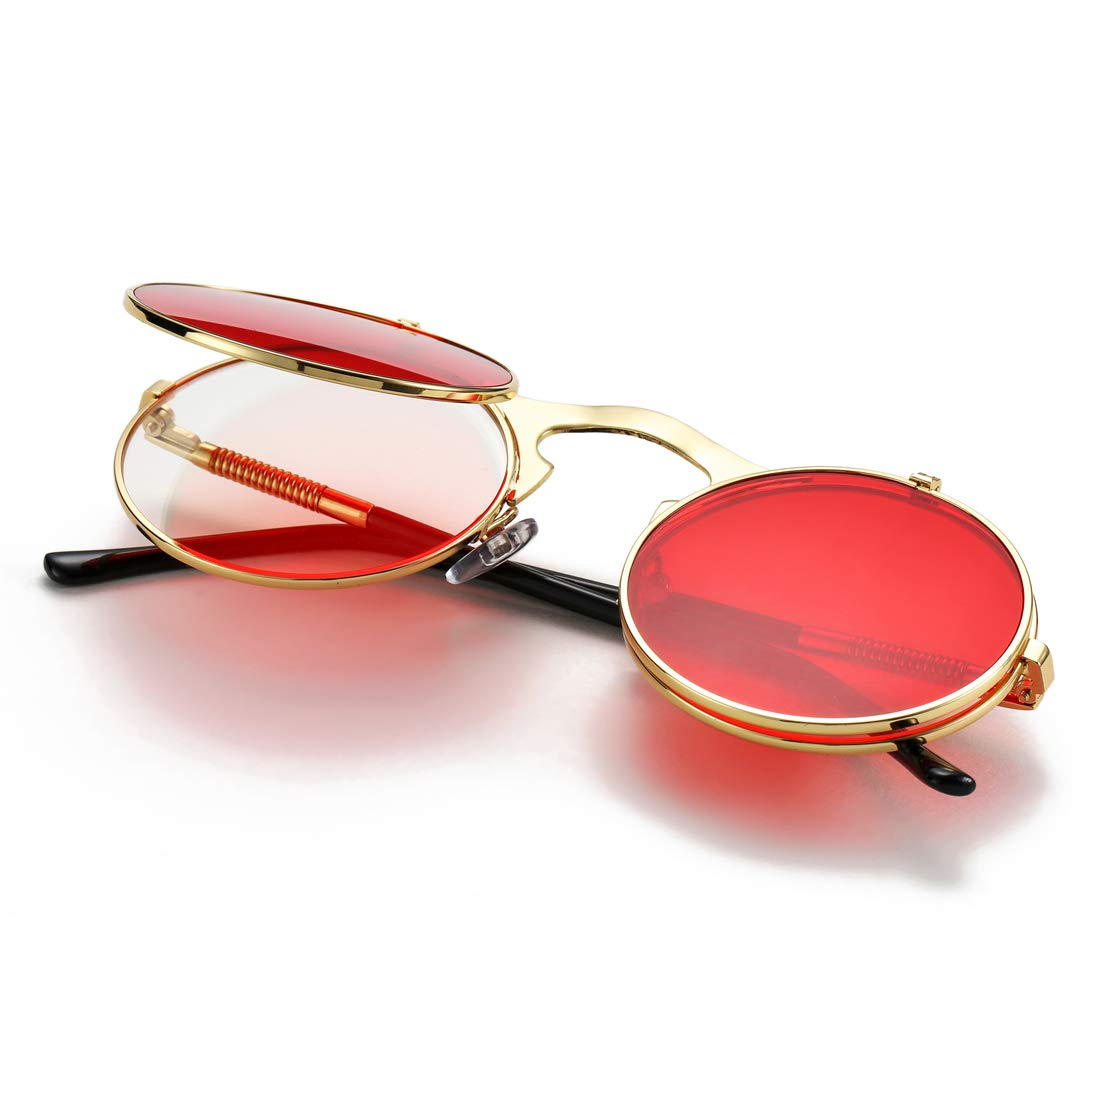 COASION Vintage Round Flip Up Sunglasses for Men Women Juniors John Lennon Style Circle Sun Glasses CA2004D